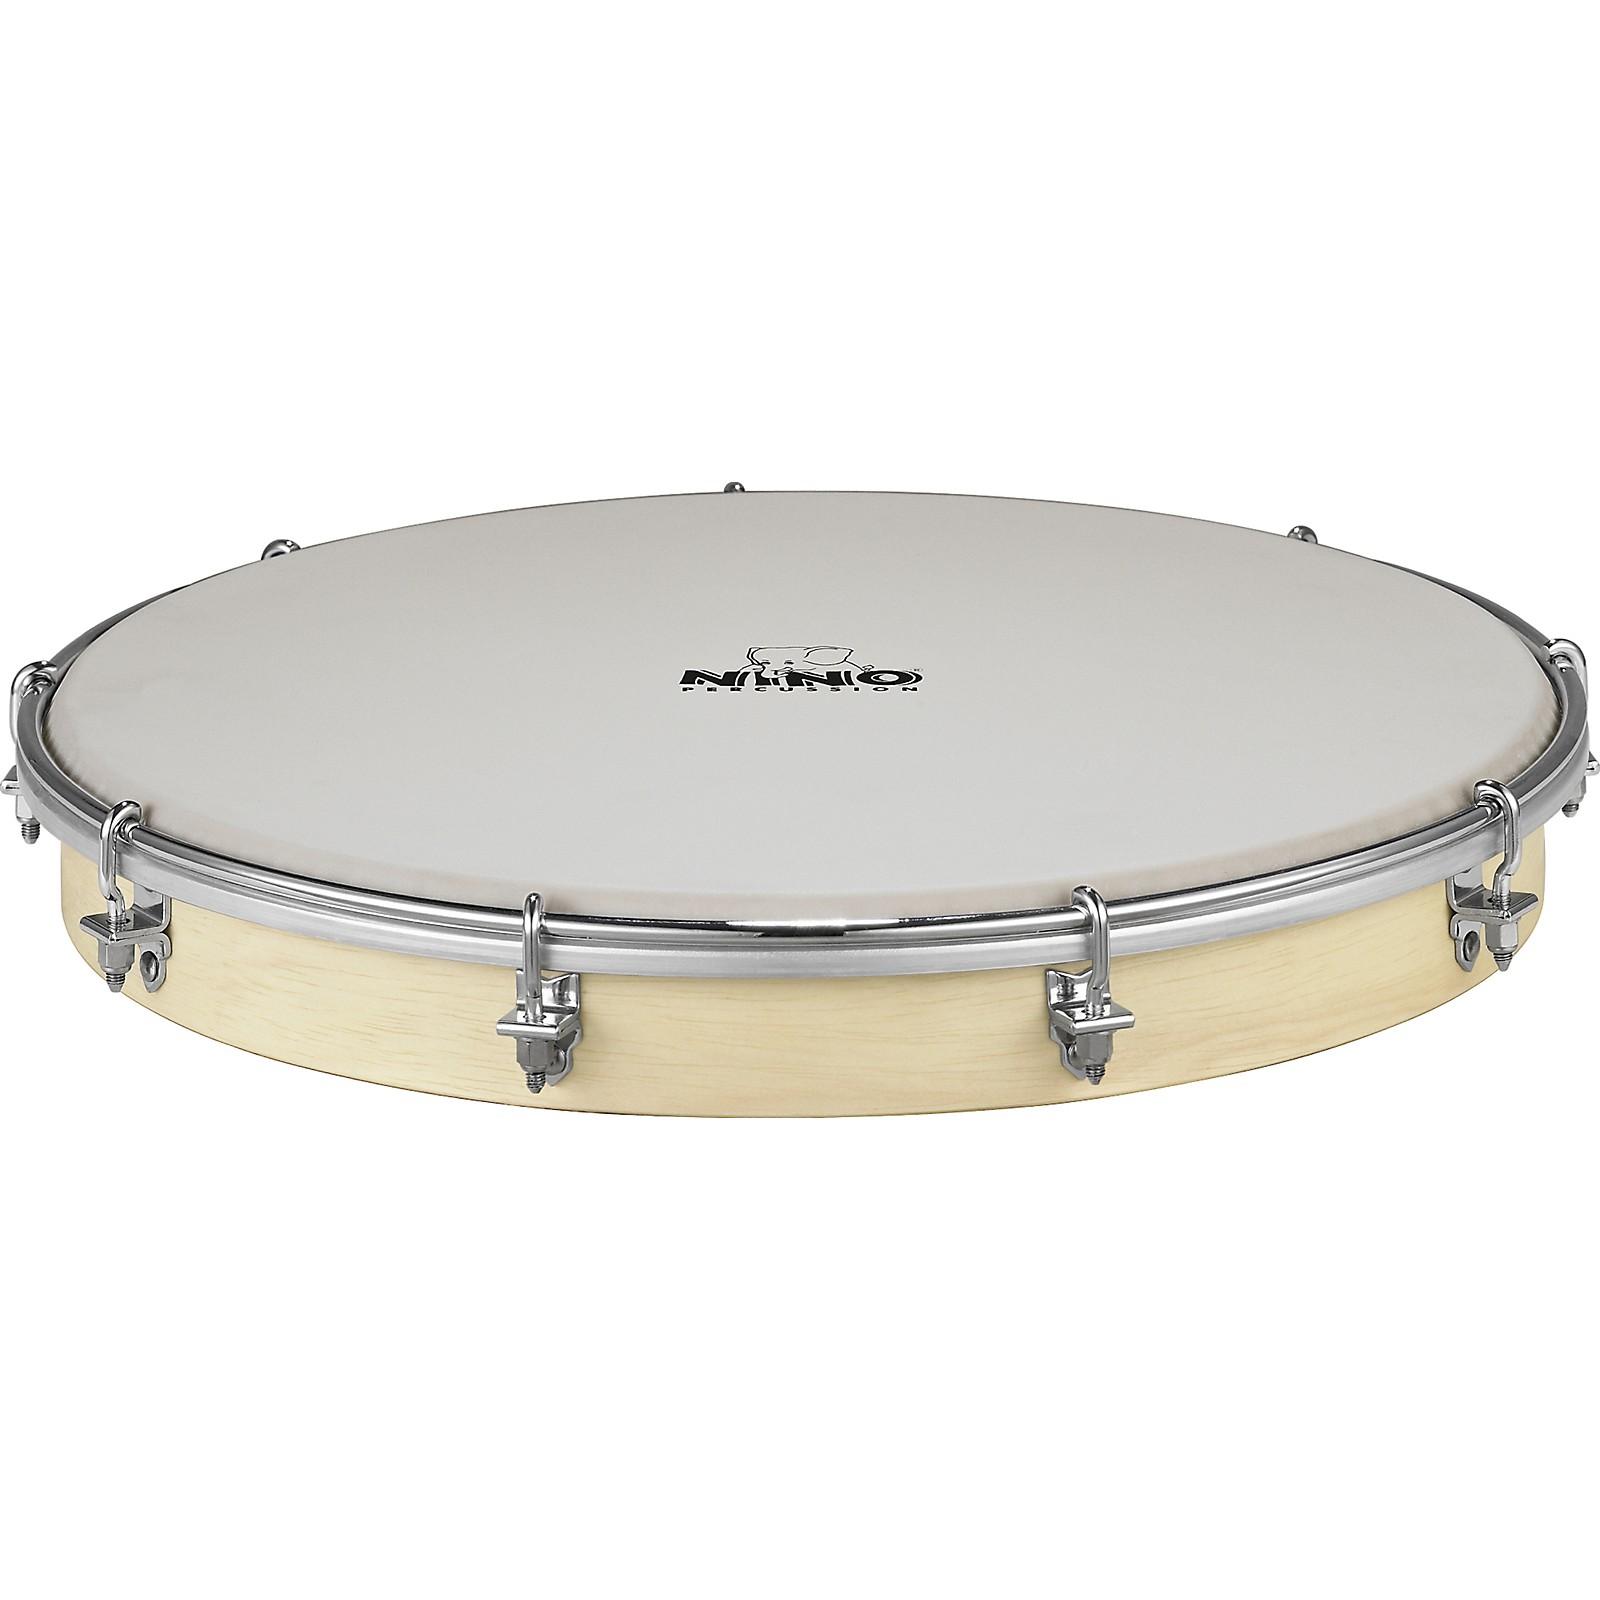 Nino Tunable Nino Hand Drum with True Feel Synthetic Head